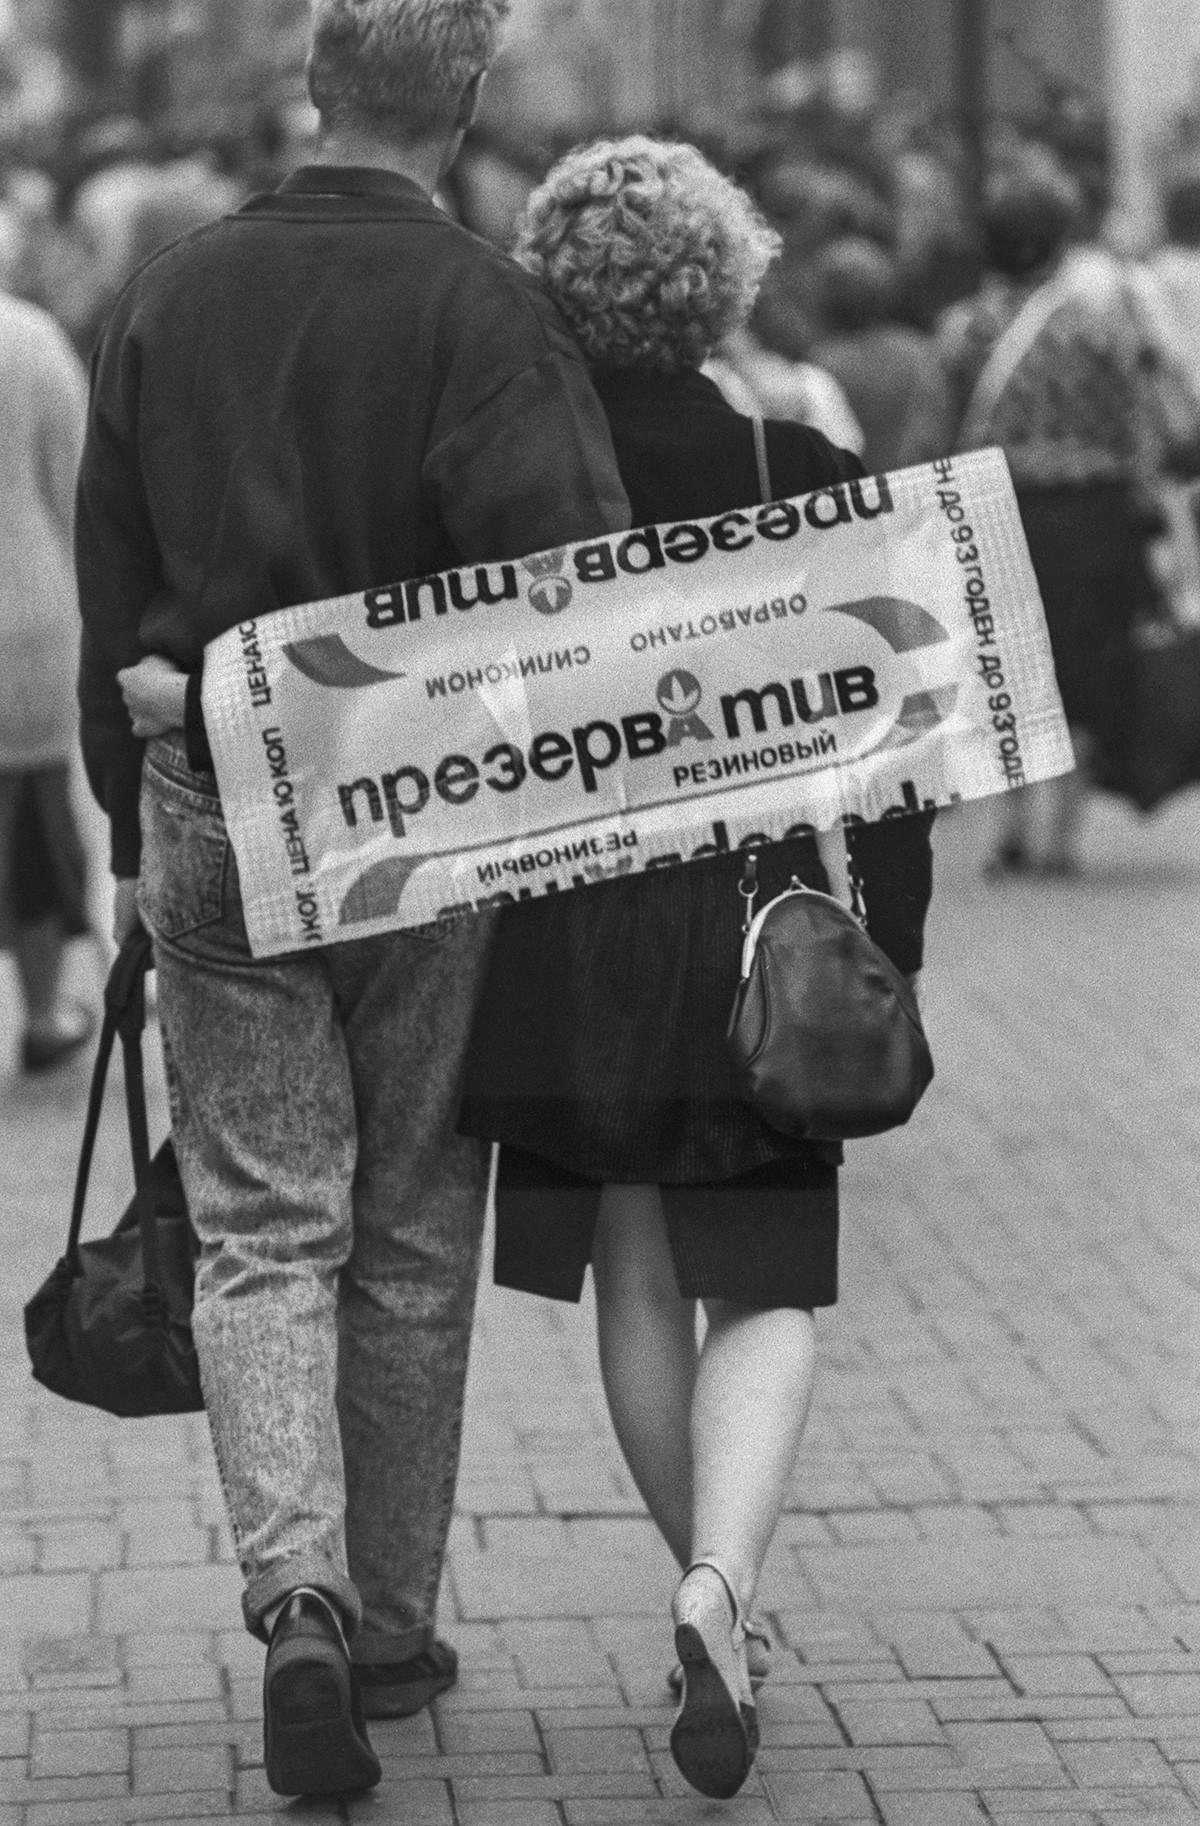 Soviet condoms, 1990.